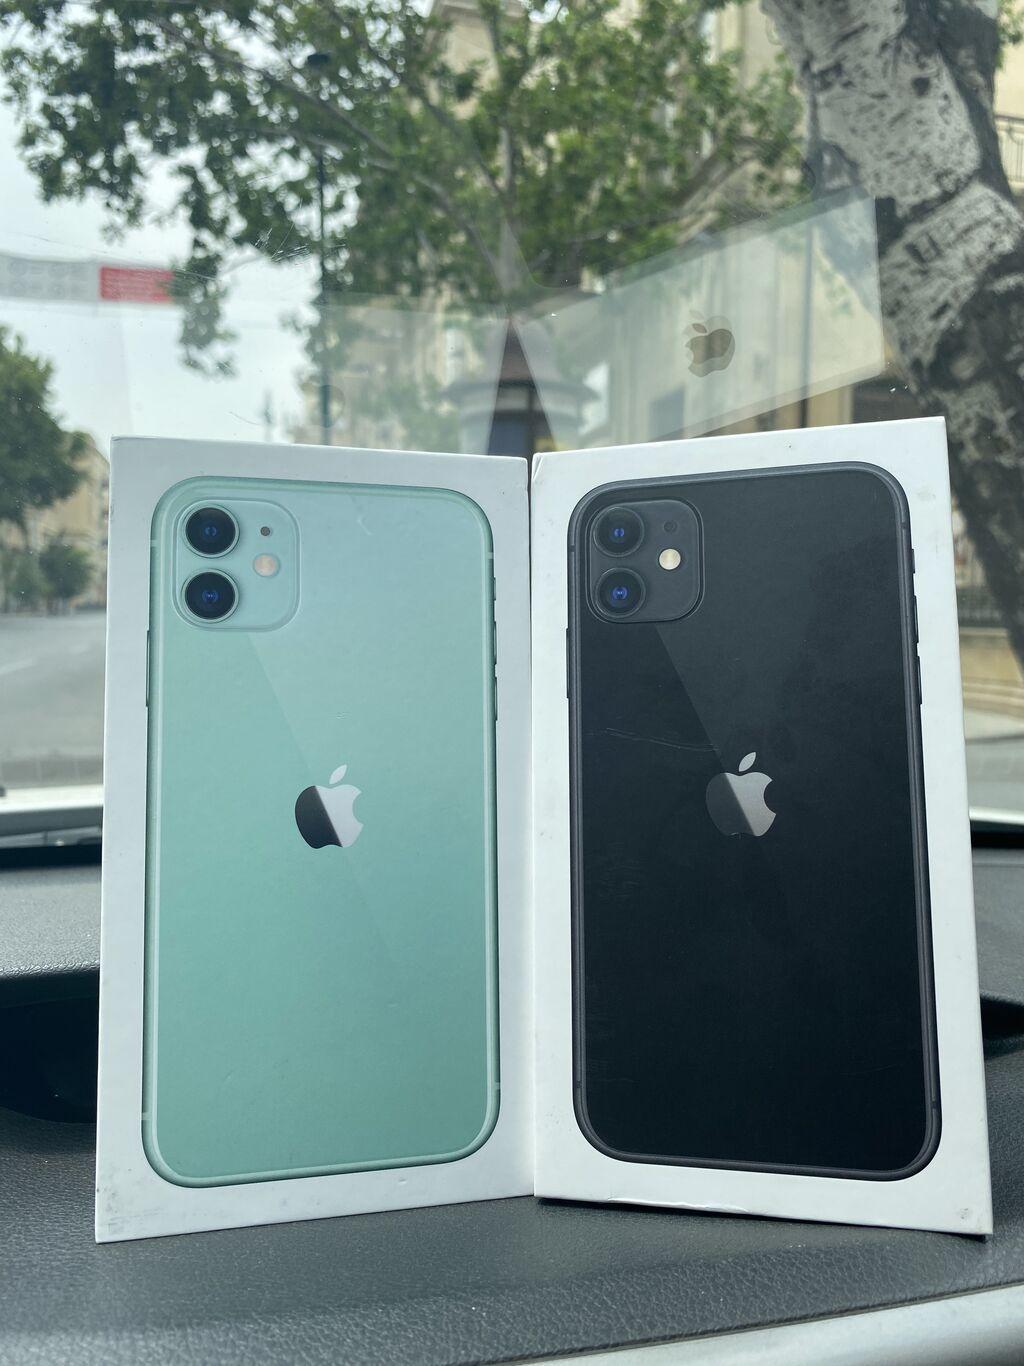 Yeni IPhone 11 64 GB Yaşıl: Yeni IPhone 11 64 GB Yaşıl